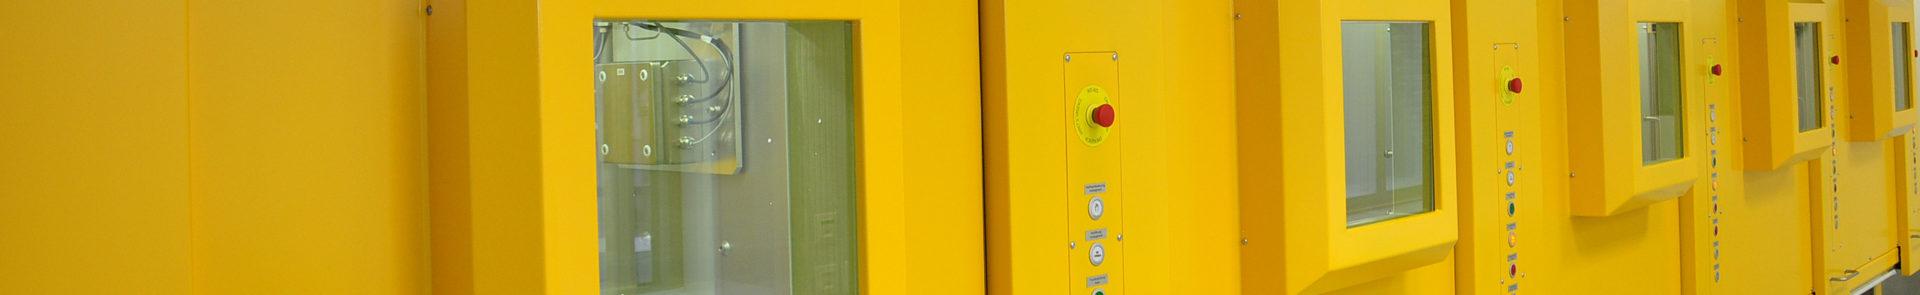 Radiation monitoring systems>